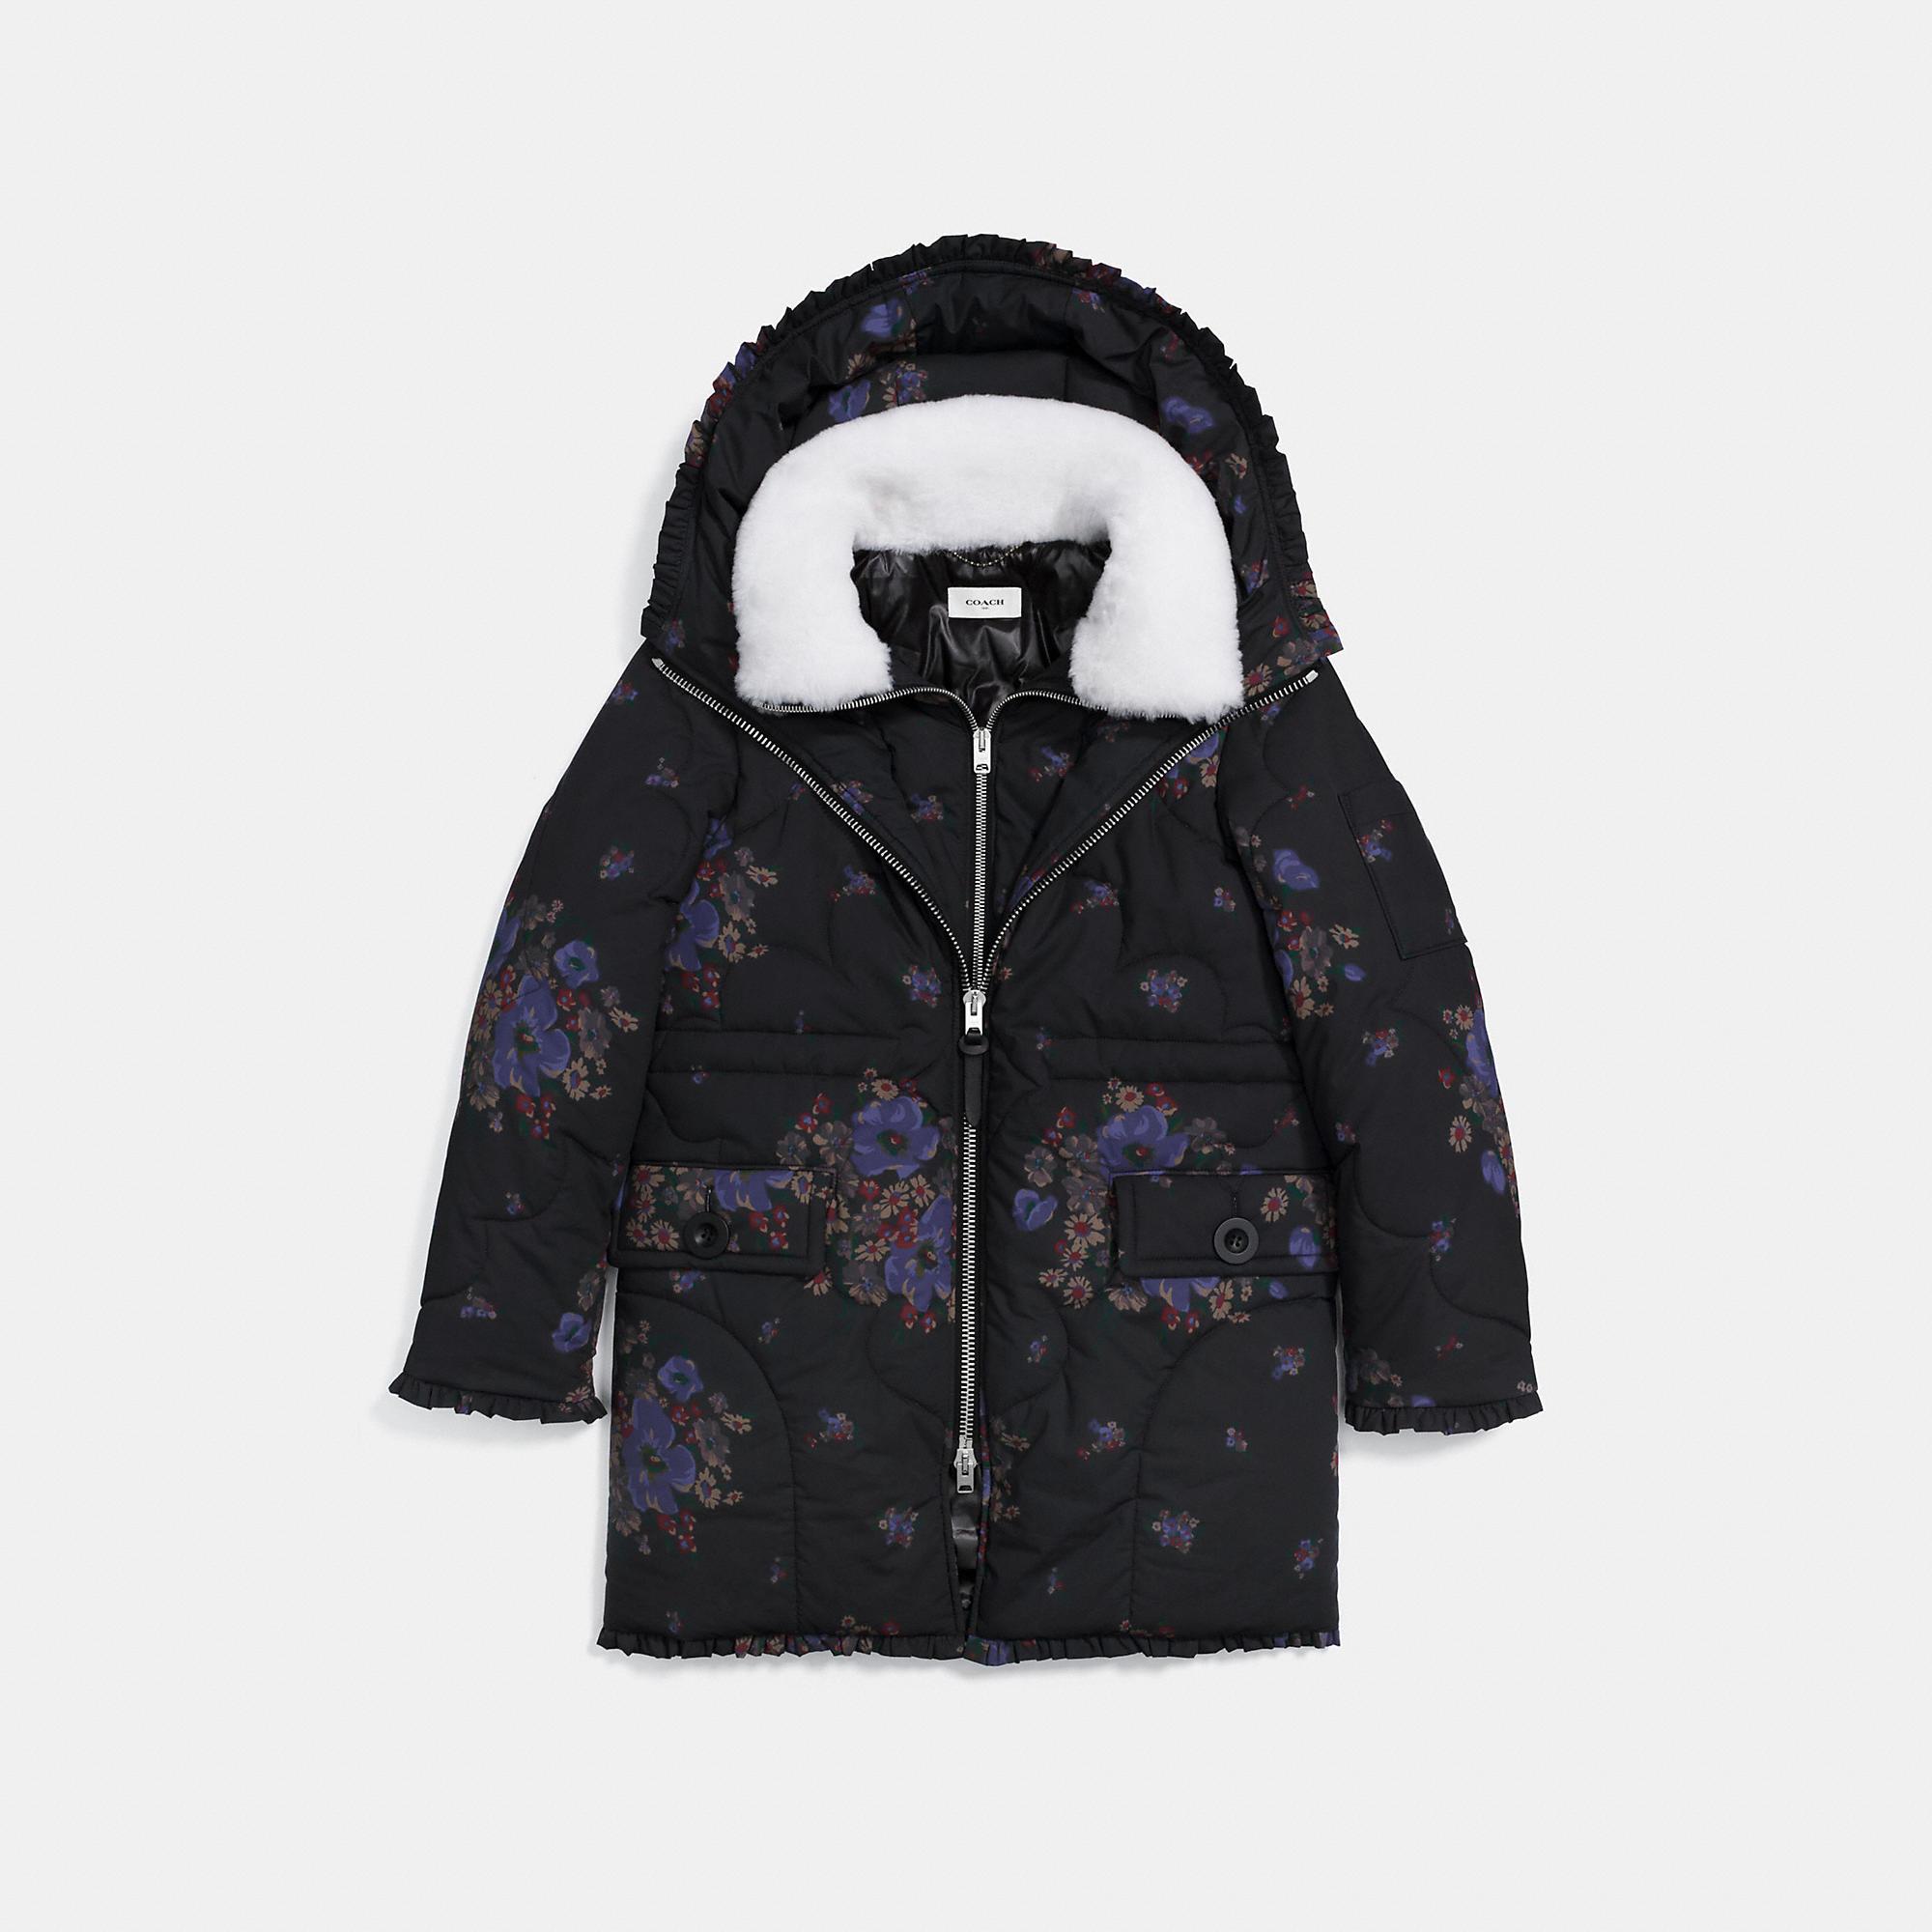 Coach Eiderdown Printed Puffer Jacket